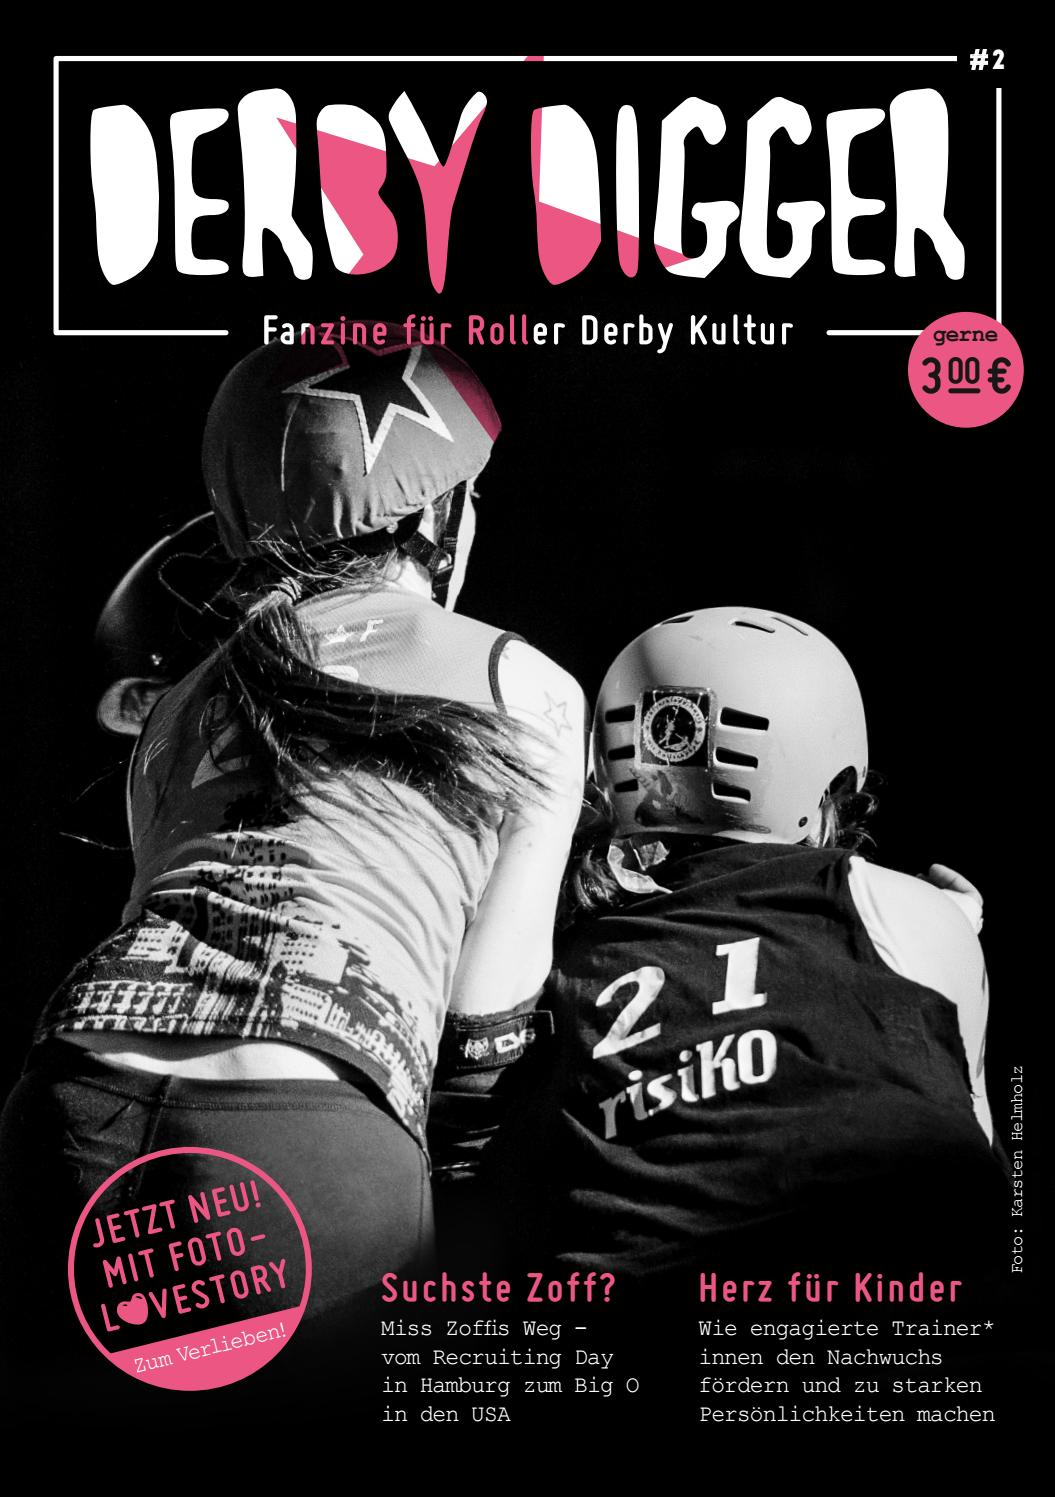 Derby Digger 2 By Derby Digger Fanzine Issuu